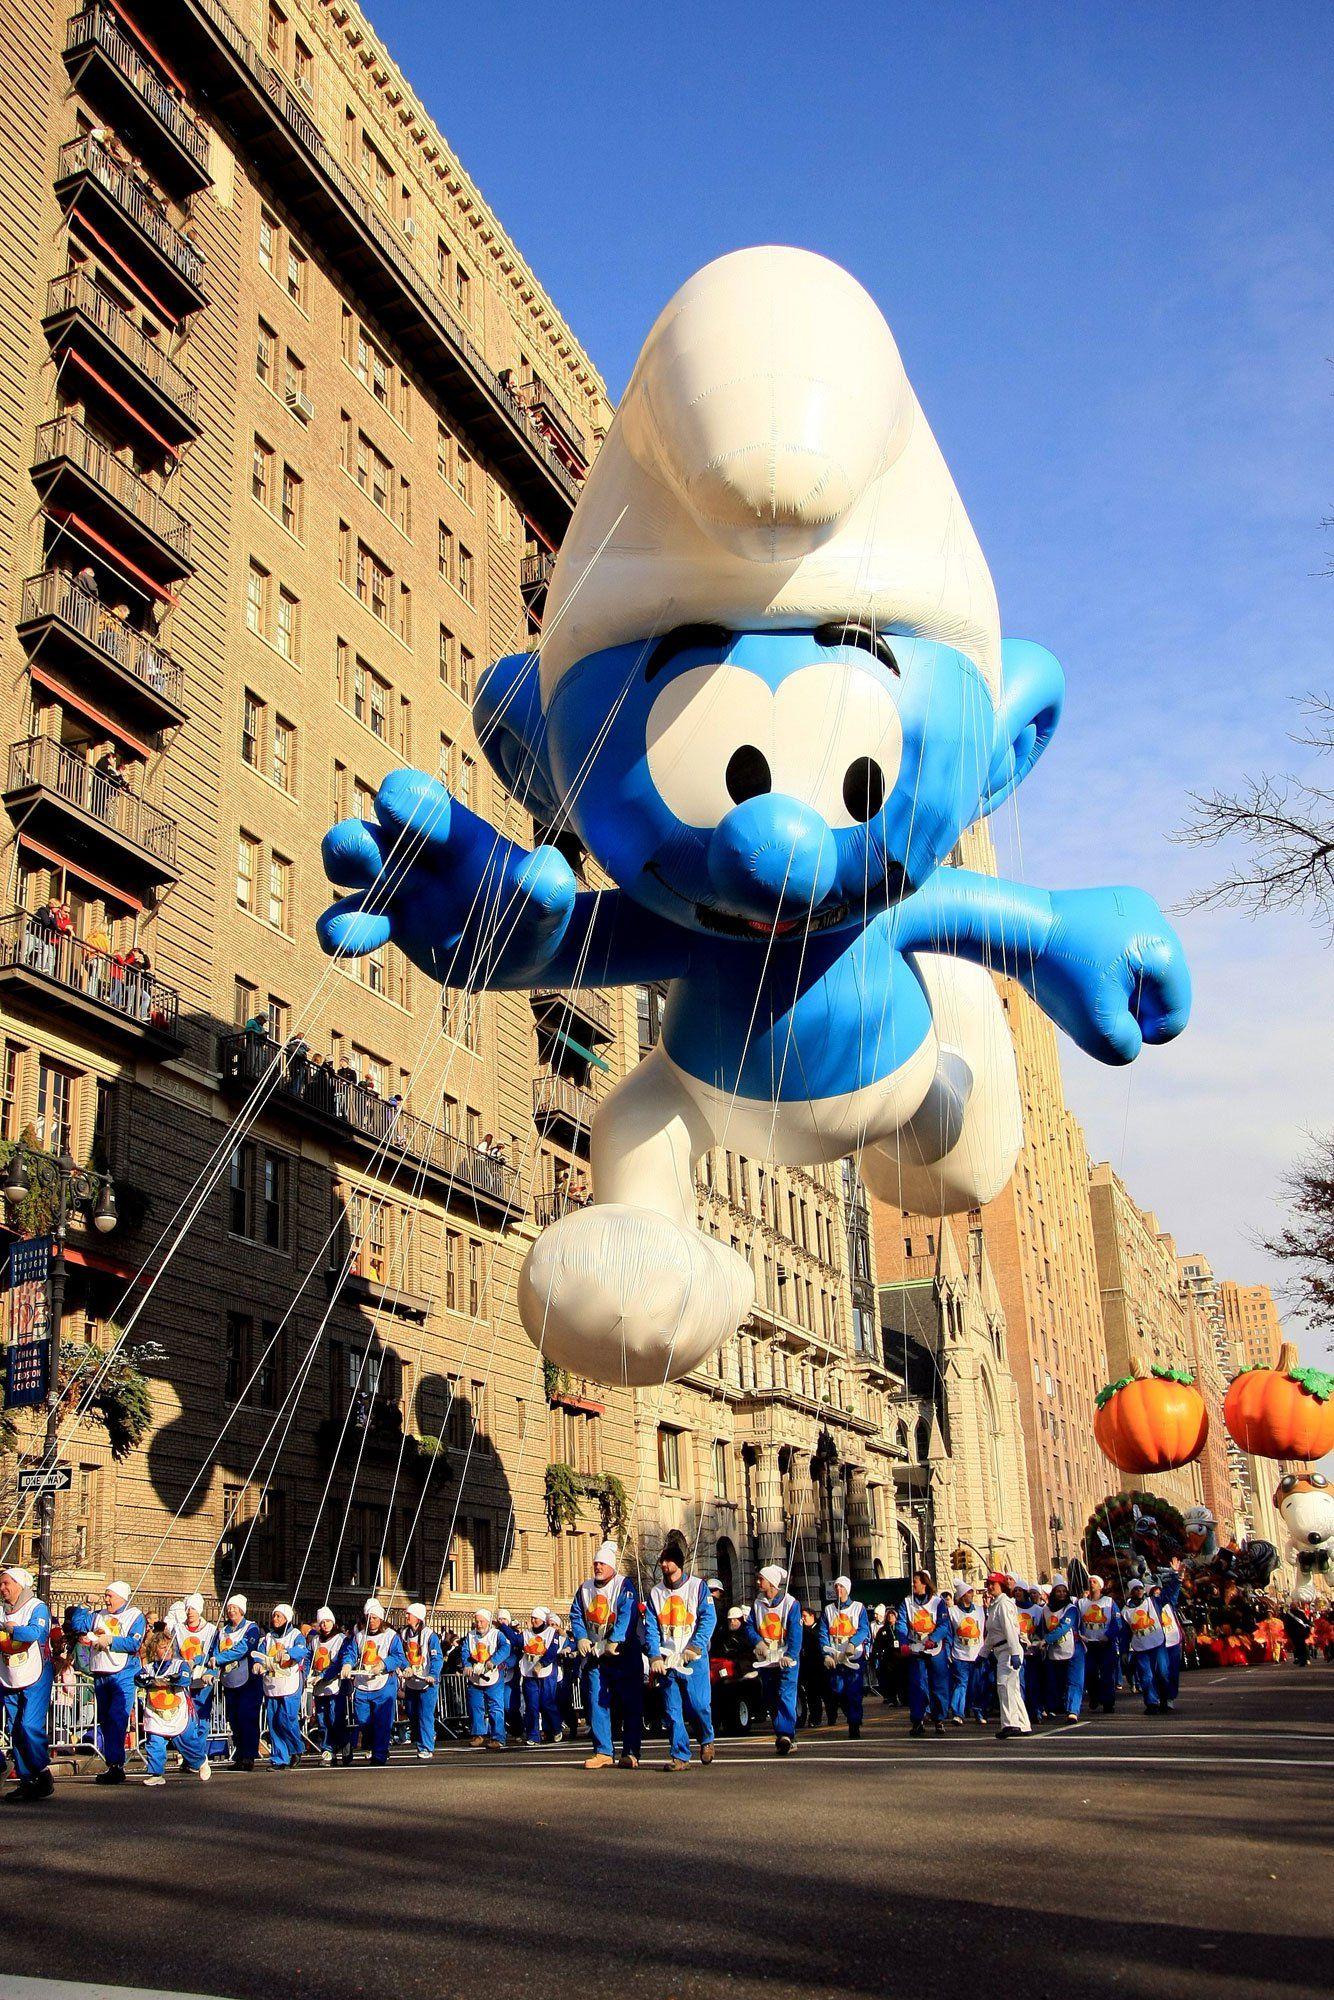 Macy S Thanksgiving Day Parade 2009 In 2020 Ballonnen Carnaval Thema